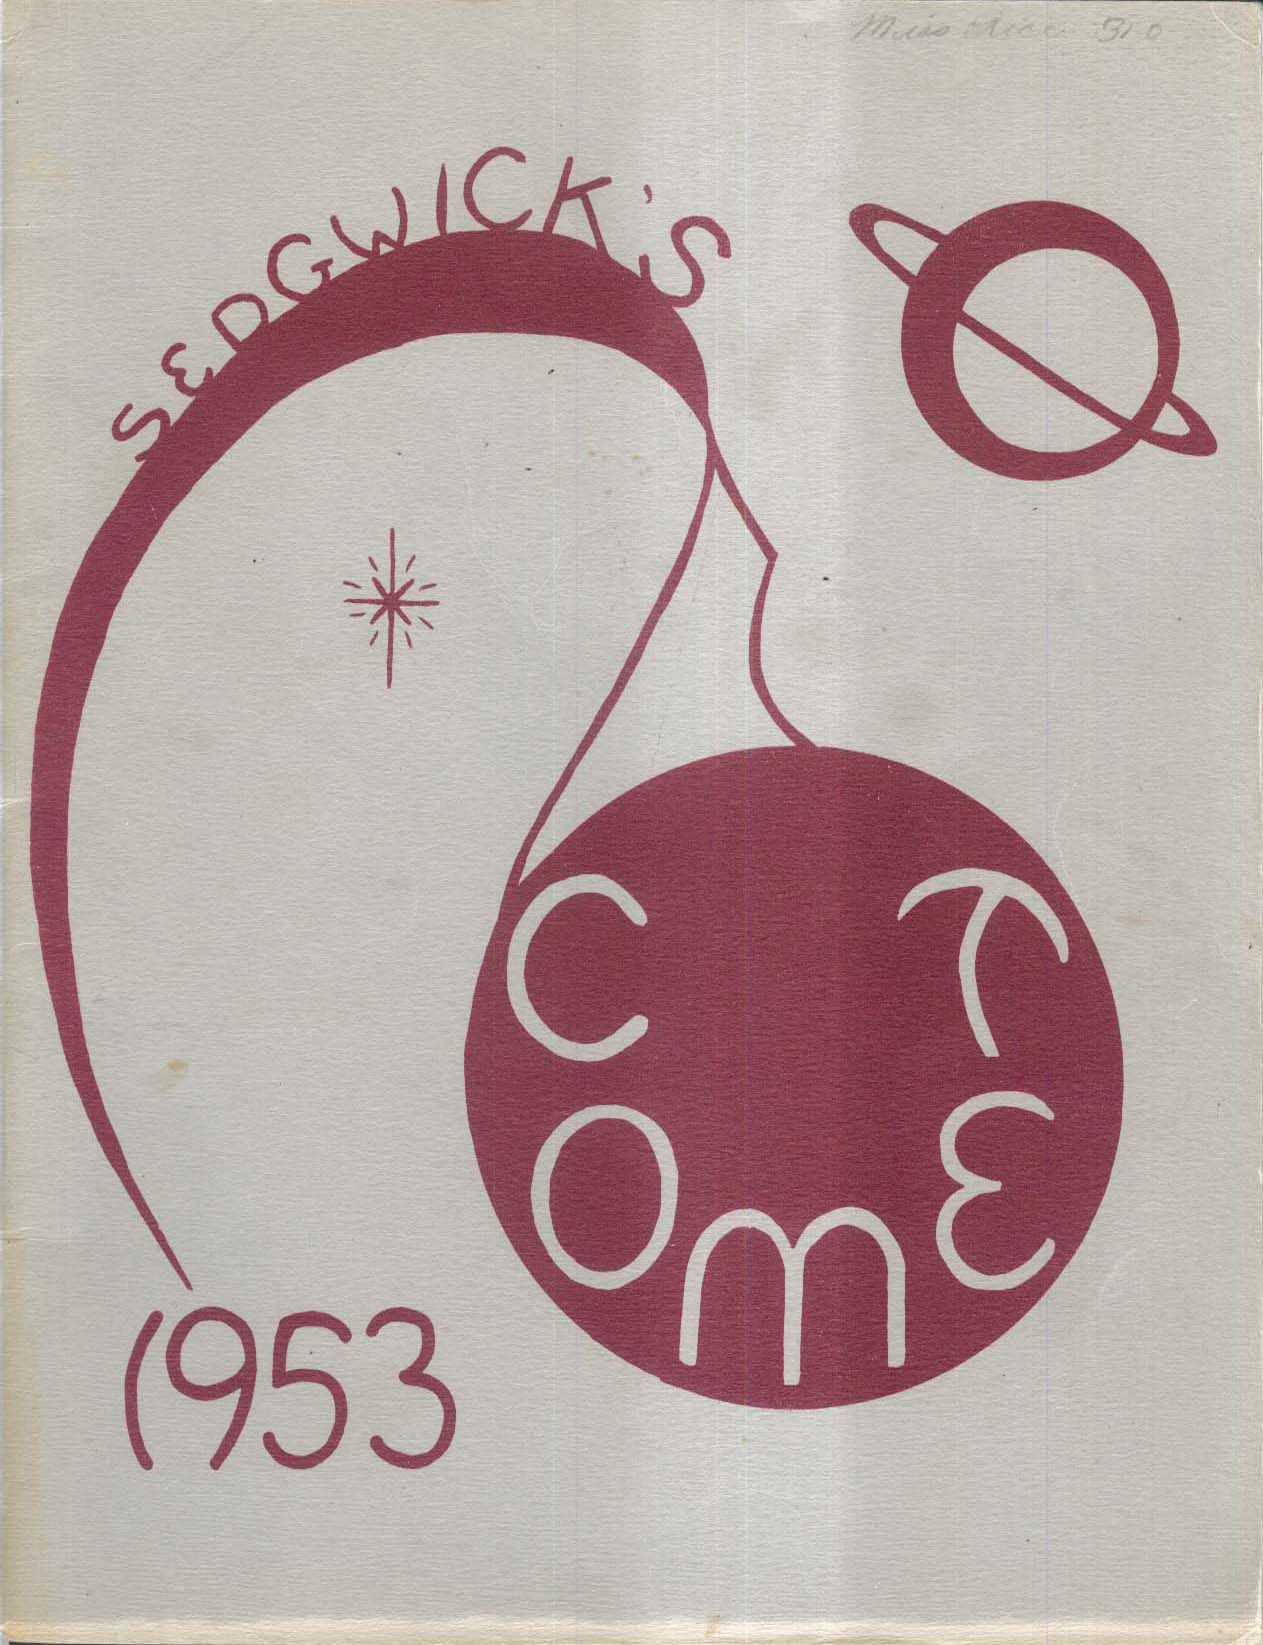 Image for Sedgwick Comet 1953 Sedgwick Junior High School West Hartford CT Yearbook